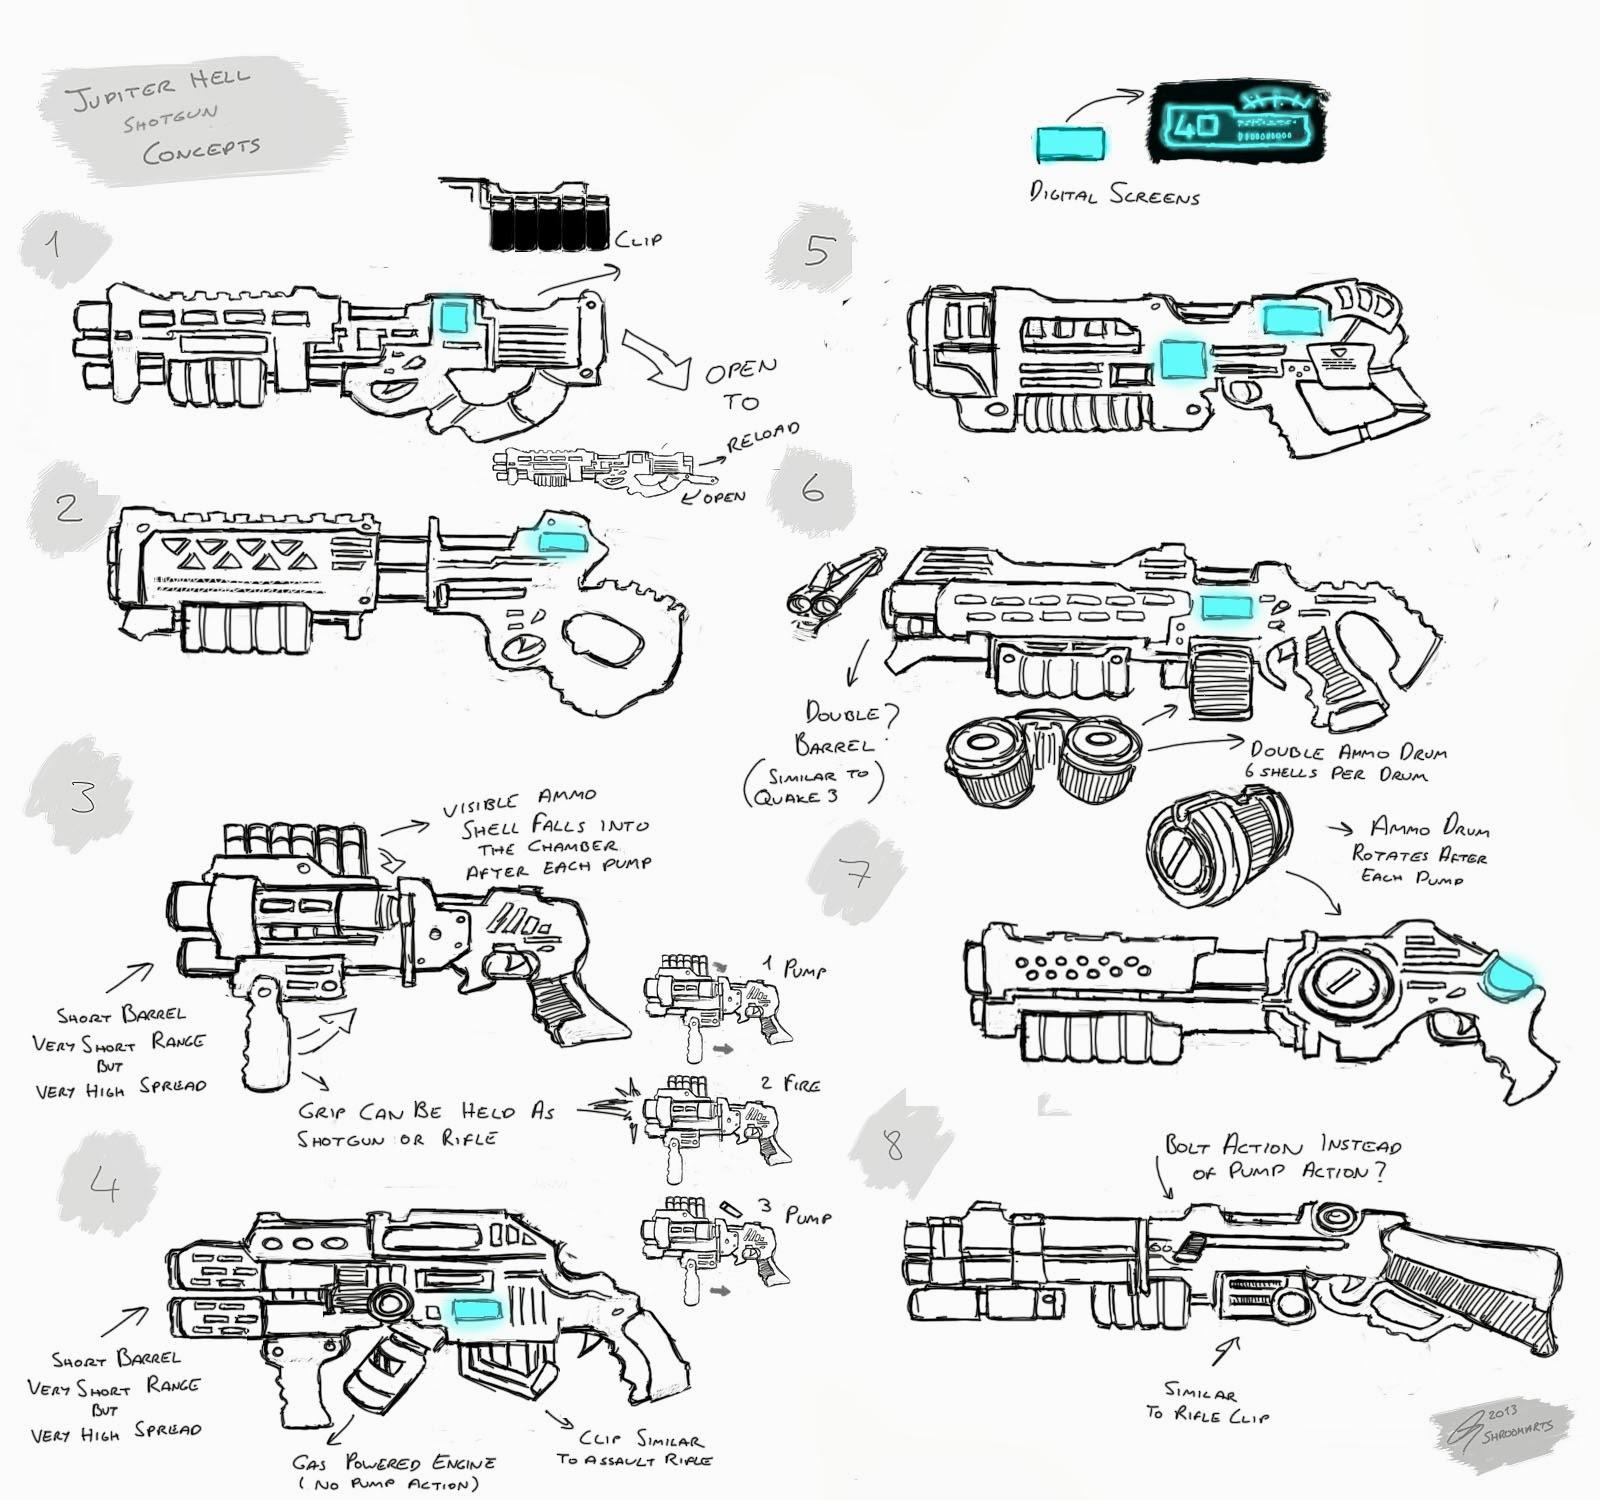 Jupiter Hell - Shotgun concepts